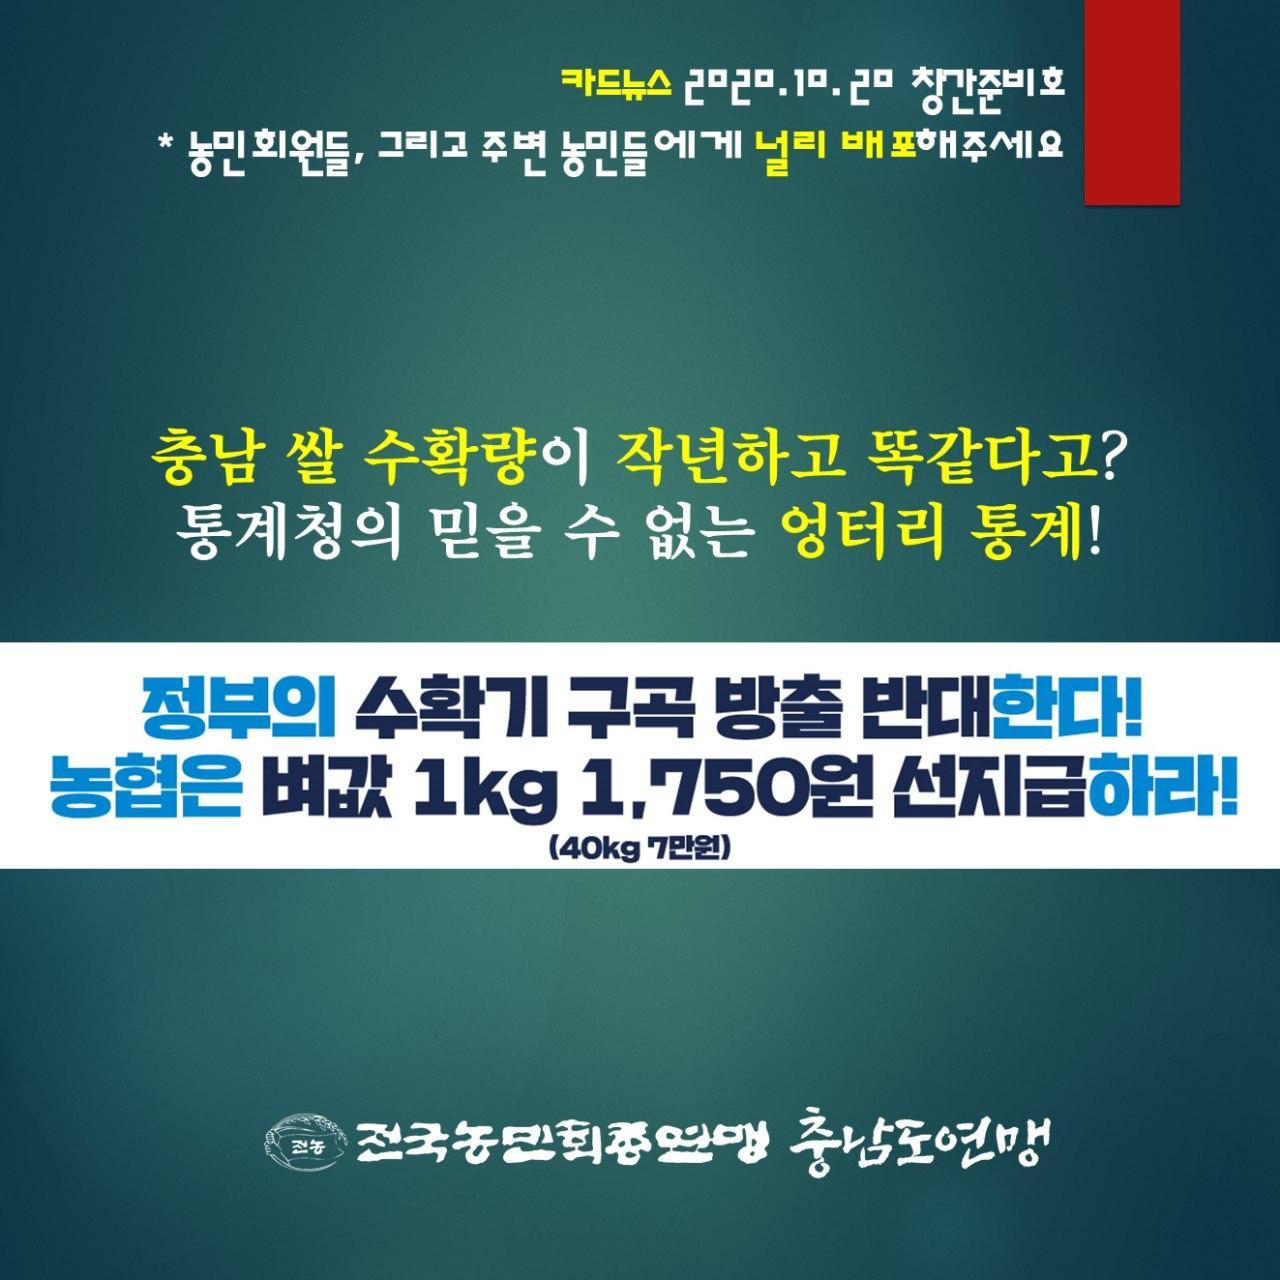 photo_2020-10-20_10-30-56.jpg